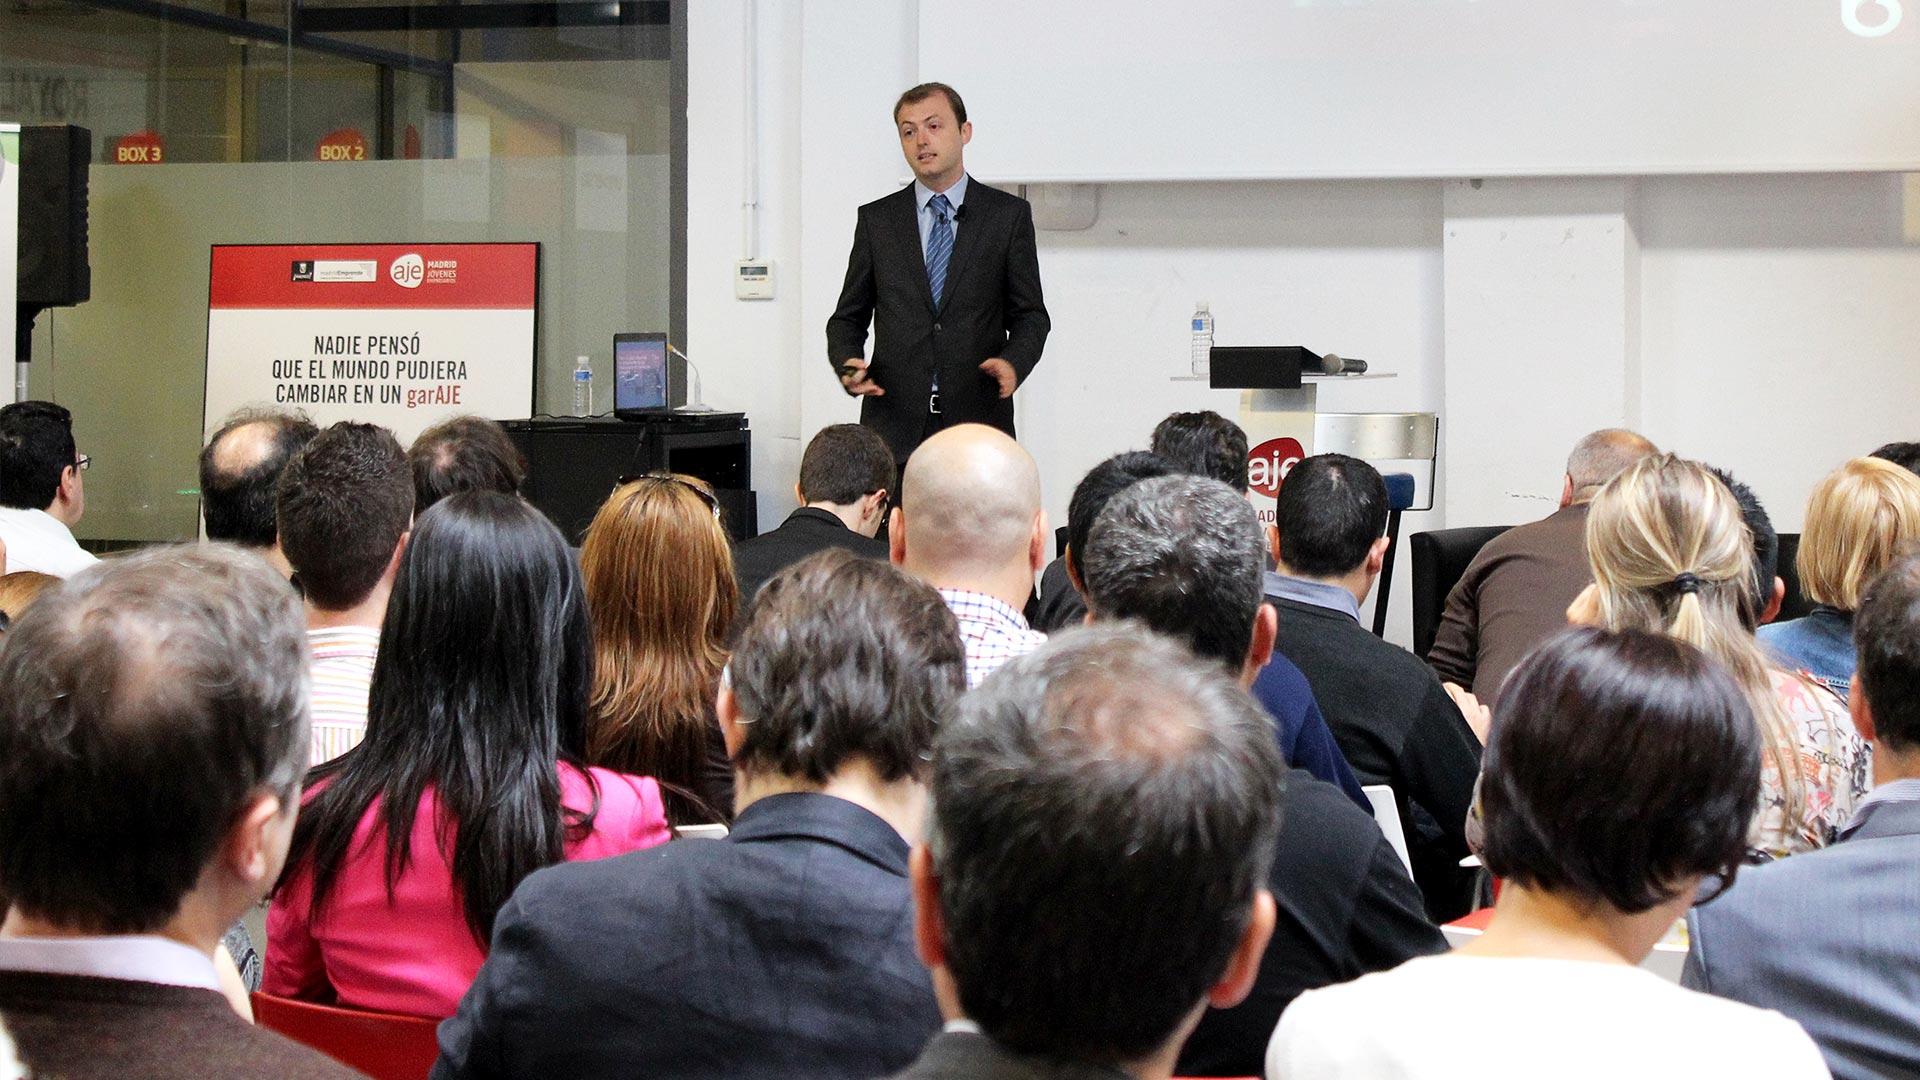 tpnet-eventos-encuentros-profesionales-iot-publico-3